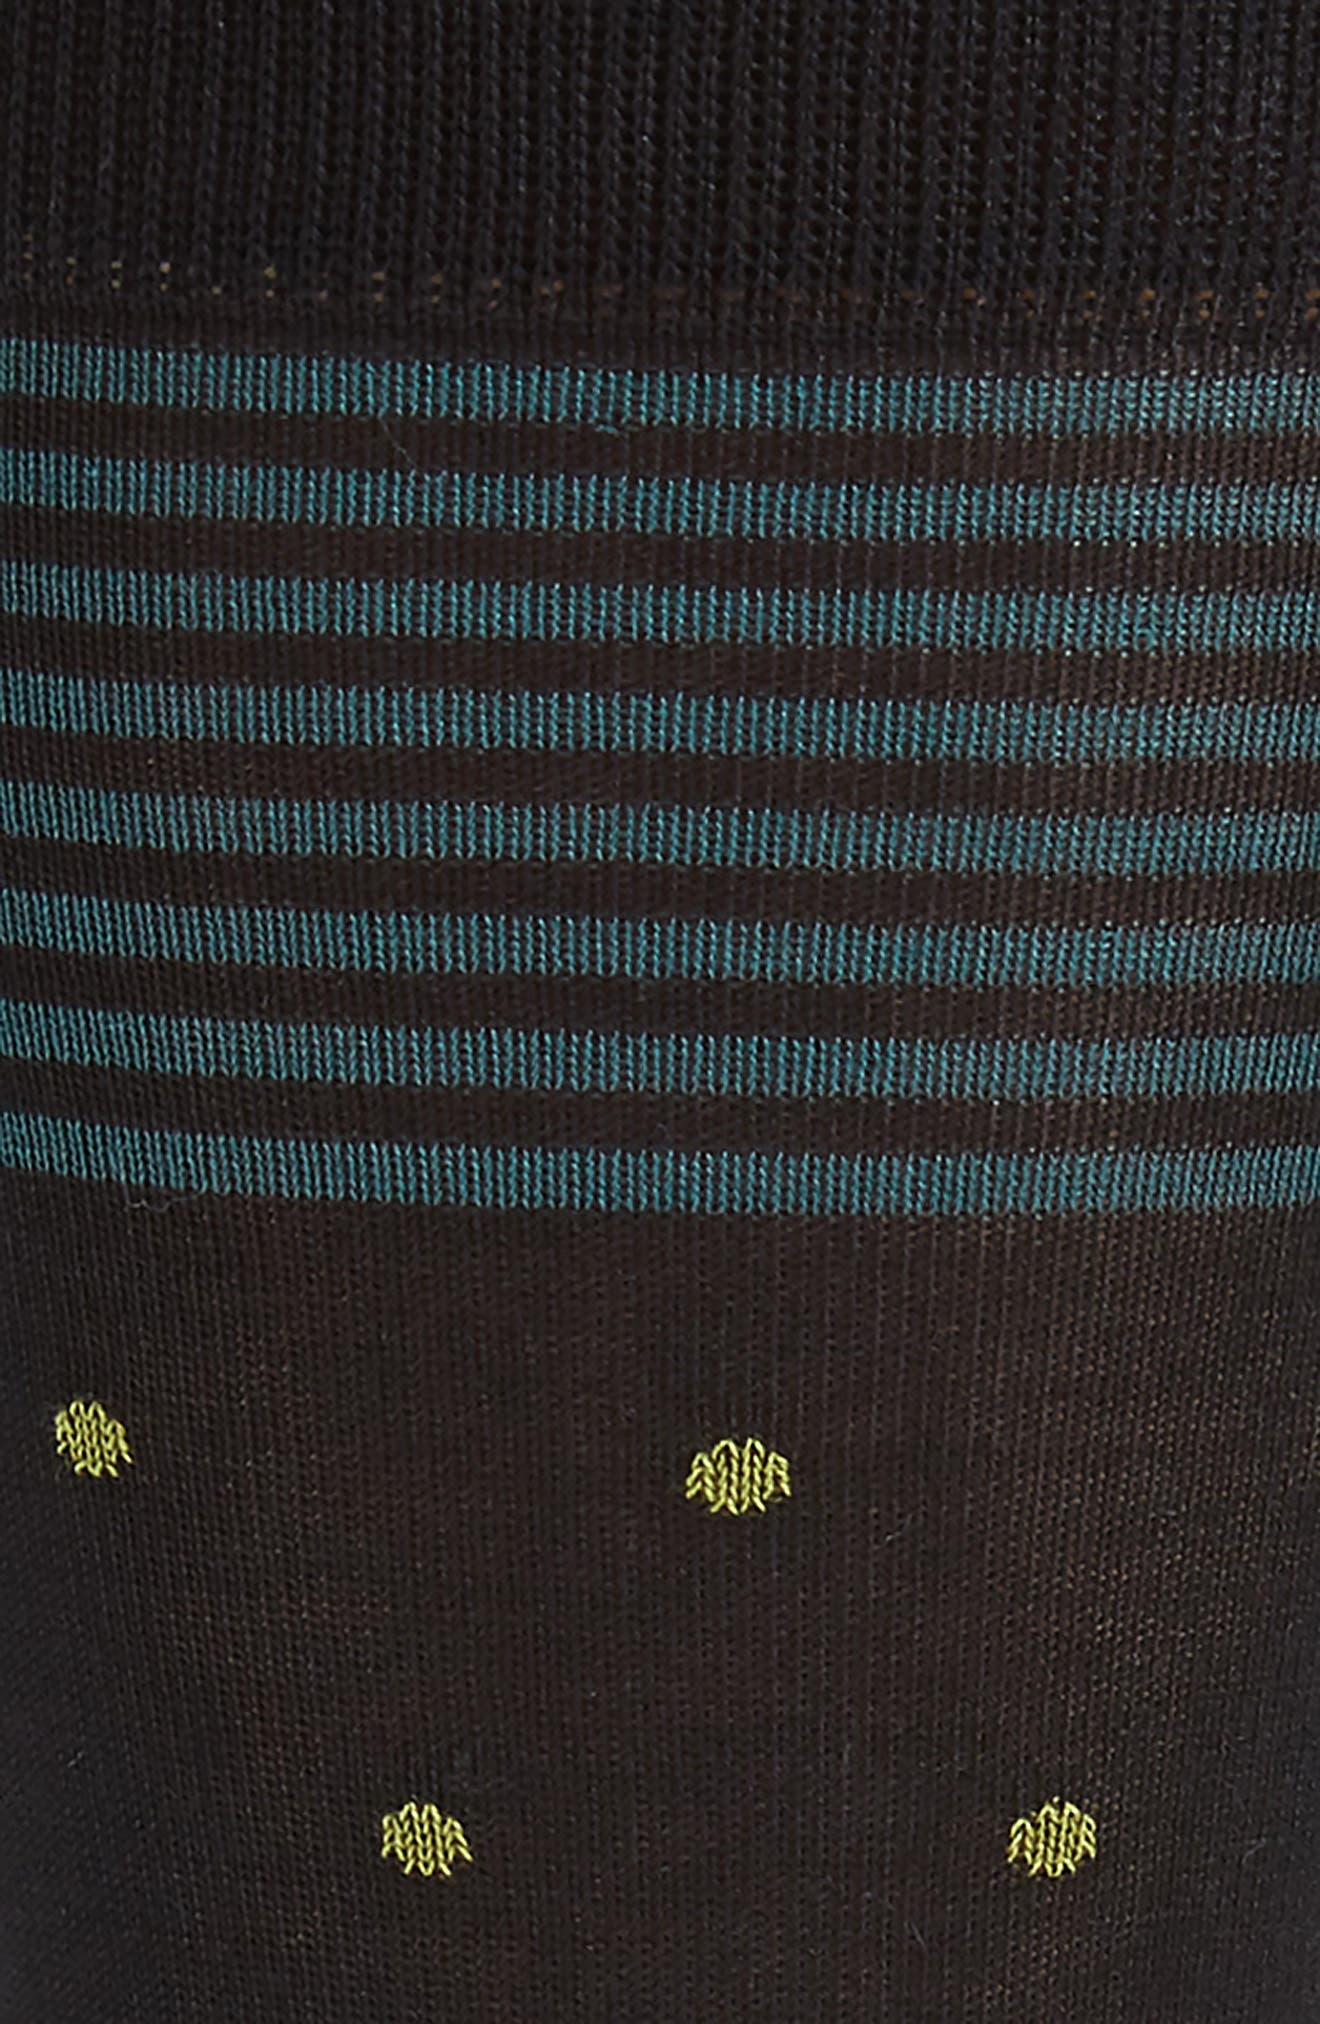 Stripe & Dot Socks,                             Alternate thumbnail 2, color,                             BLACK/ OLIVE